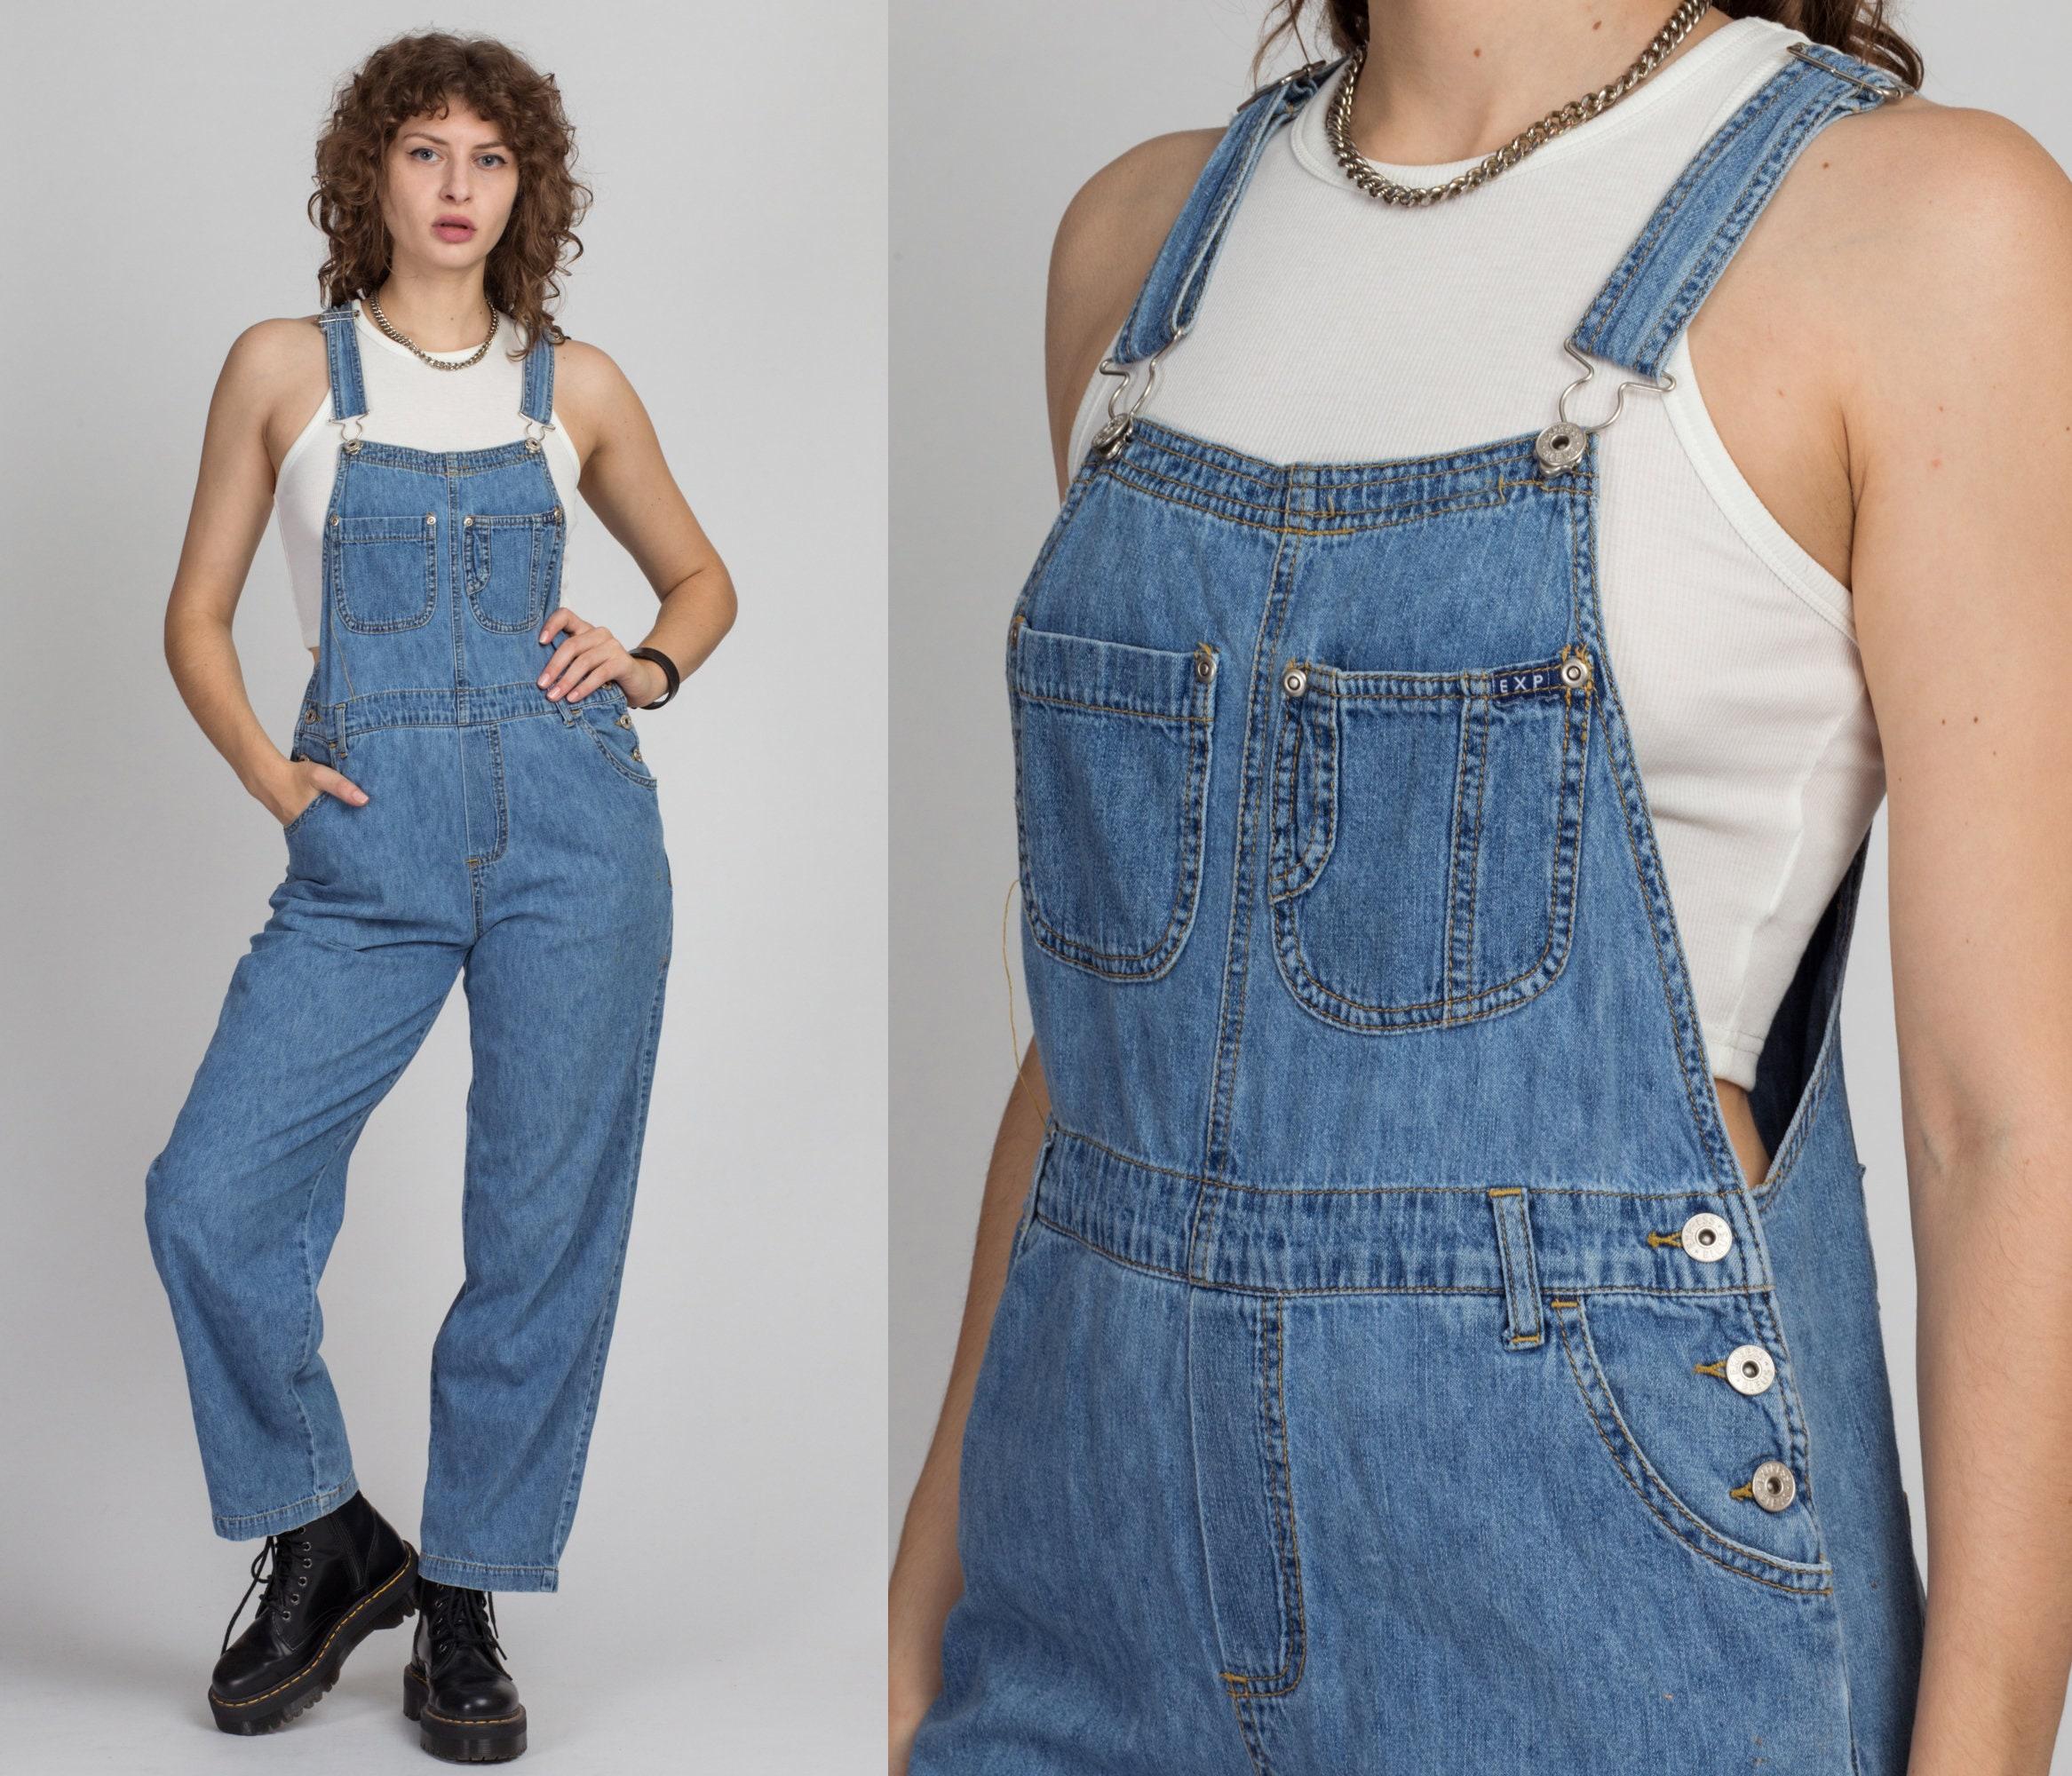 Vintage Overalls & Jumpsuits Vintage Express Jean Overalls - Medium  90S Denim Overall Pants Womens Dungarees $19.95 AT vintagedancer.com